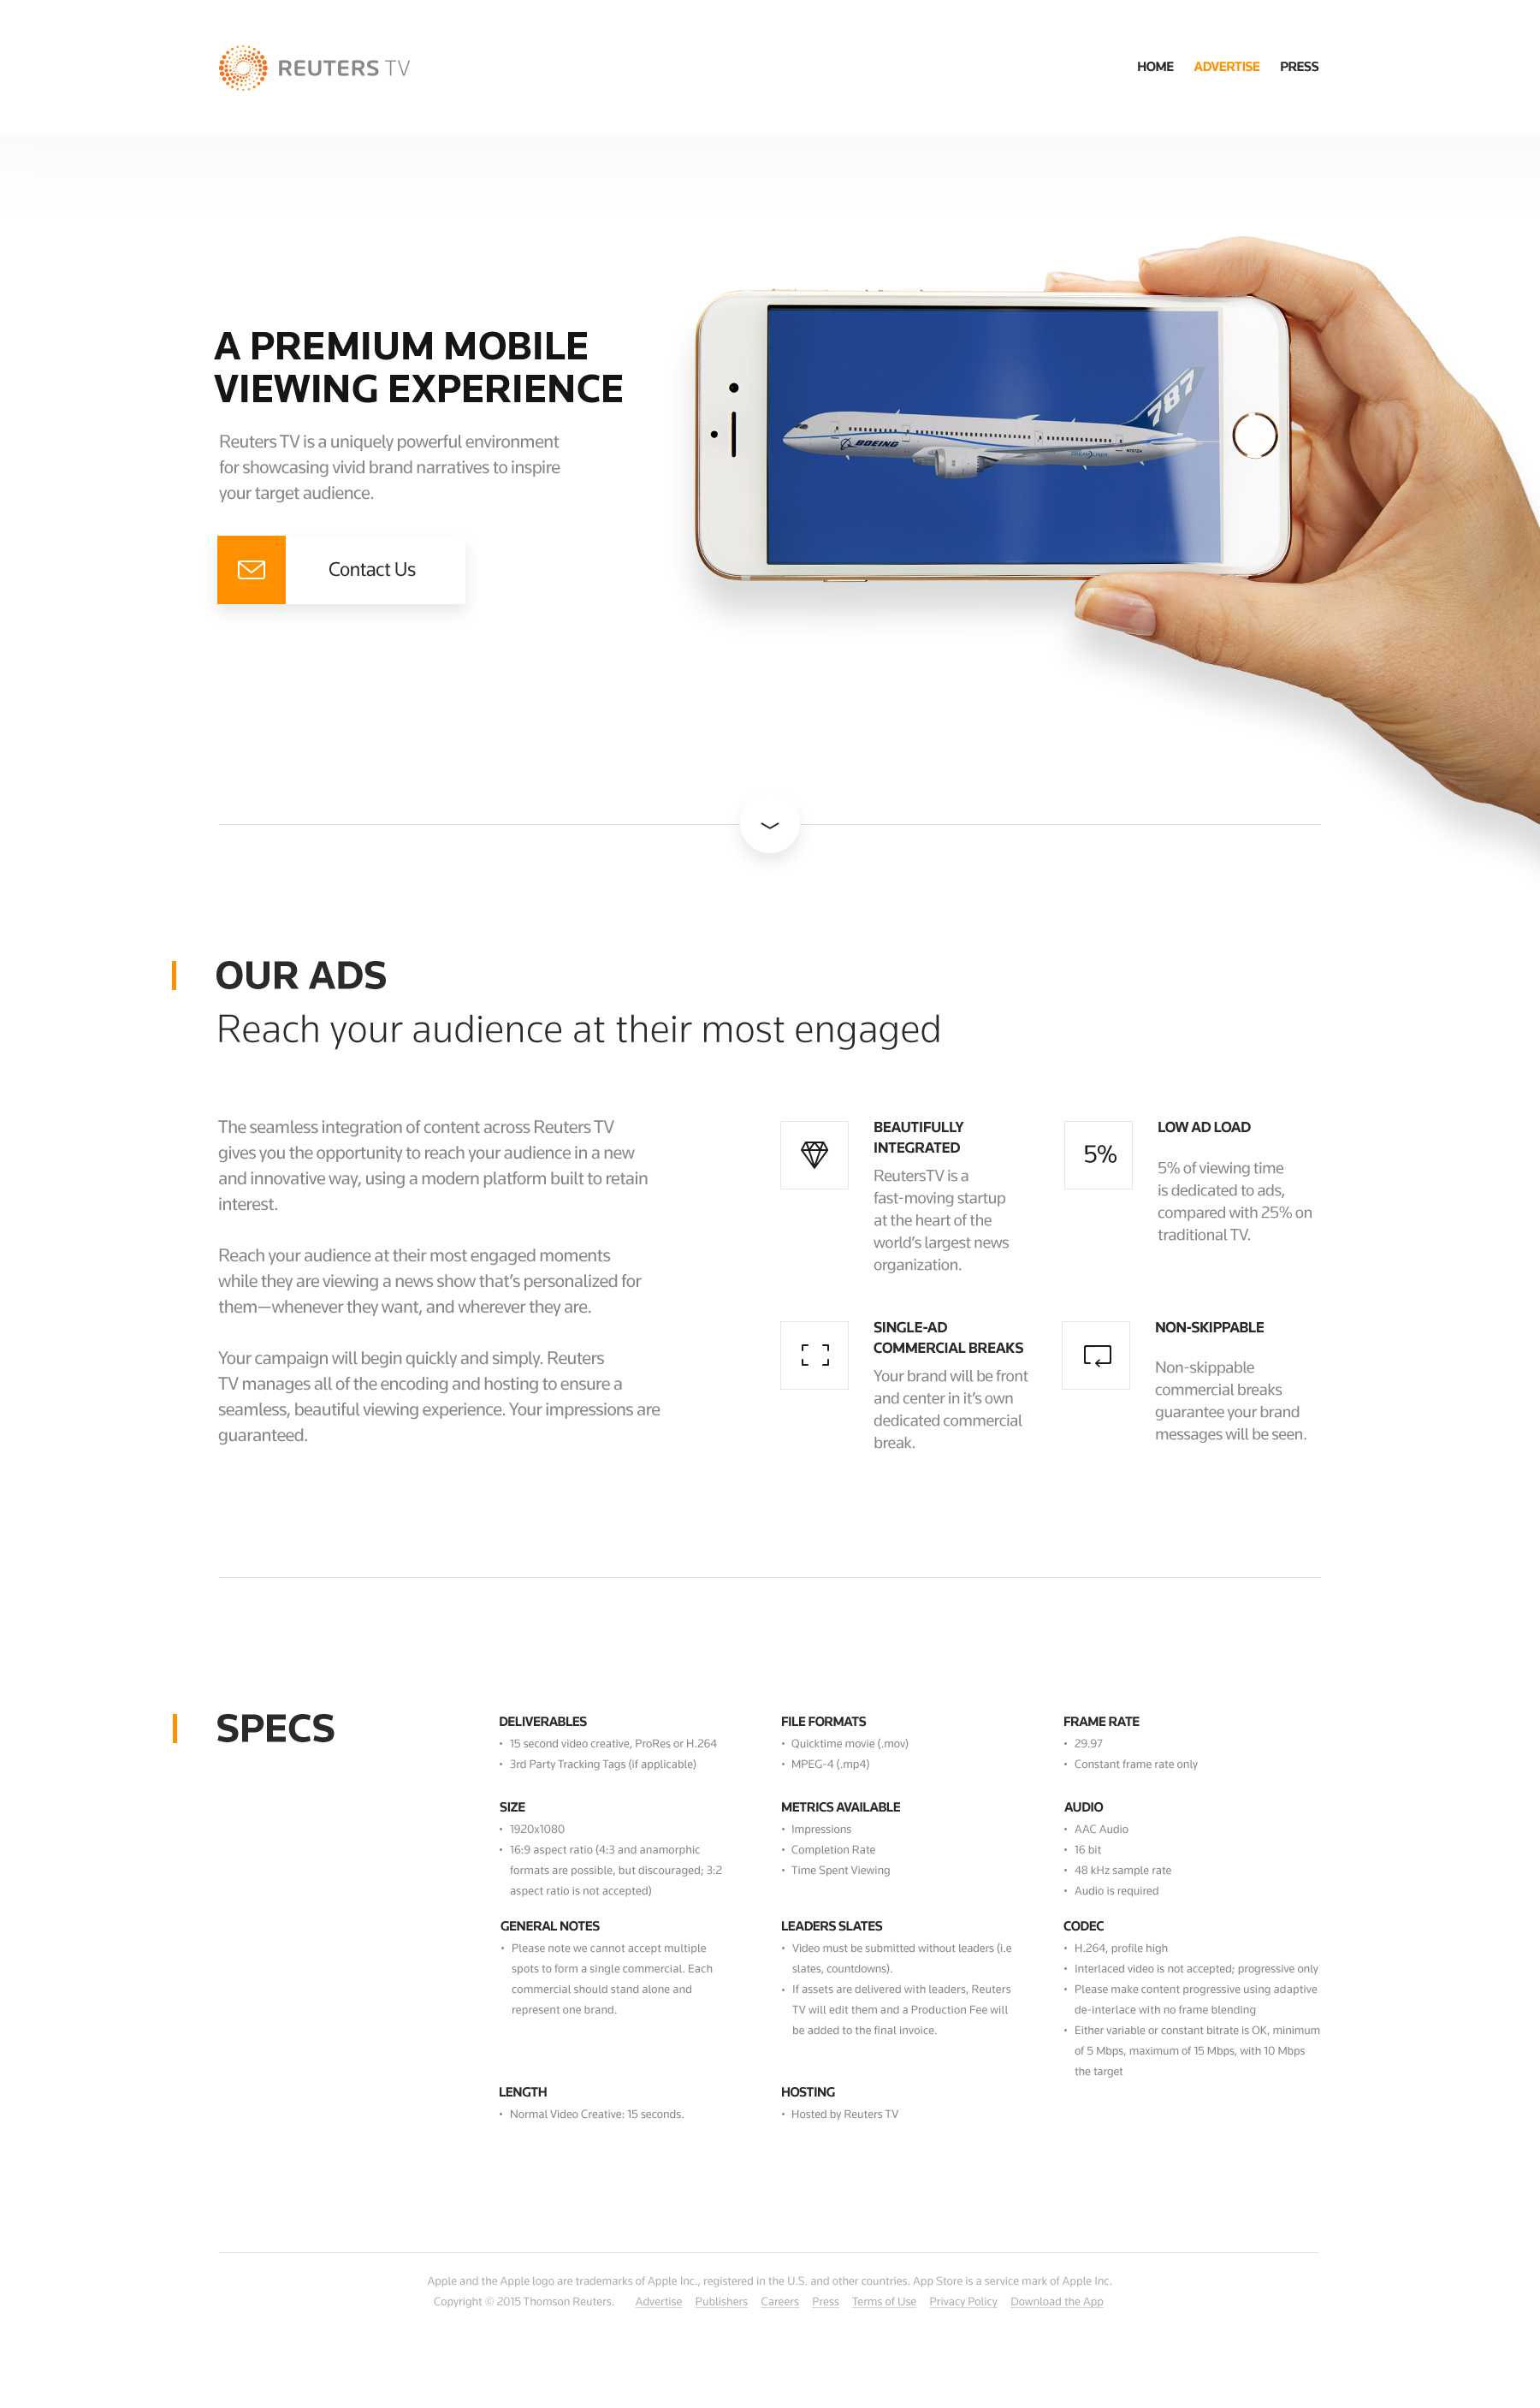 ads_large.jpg by UENO.